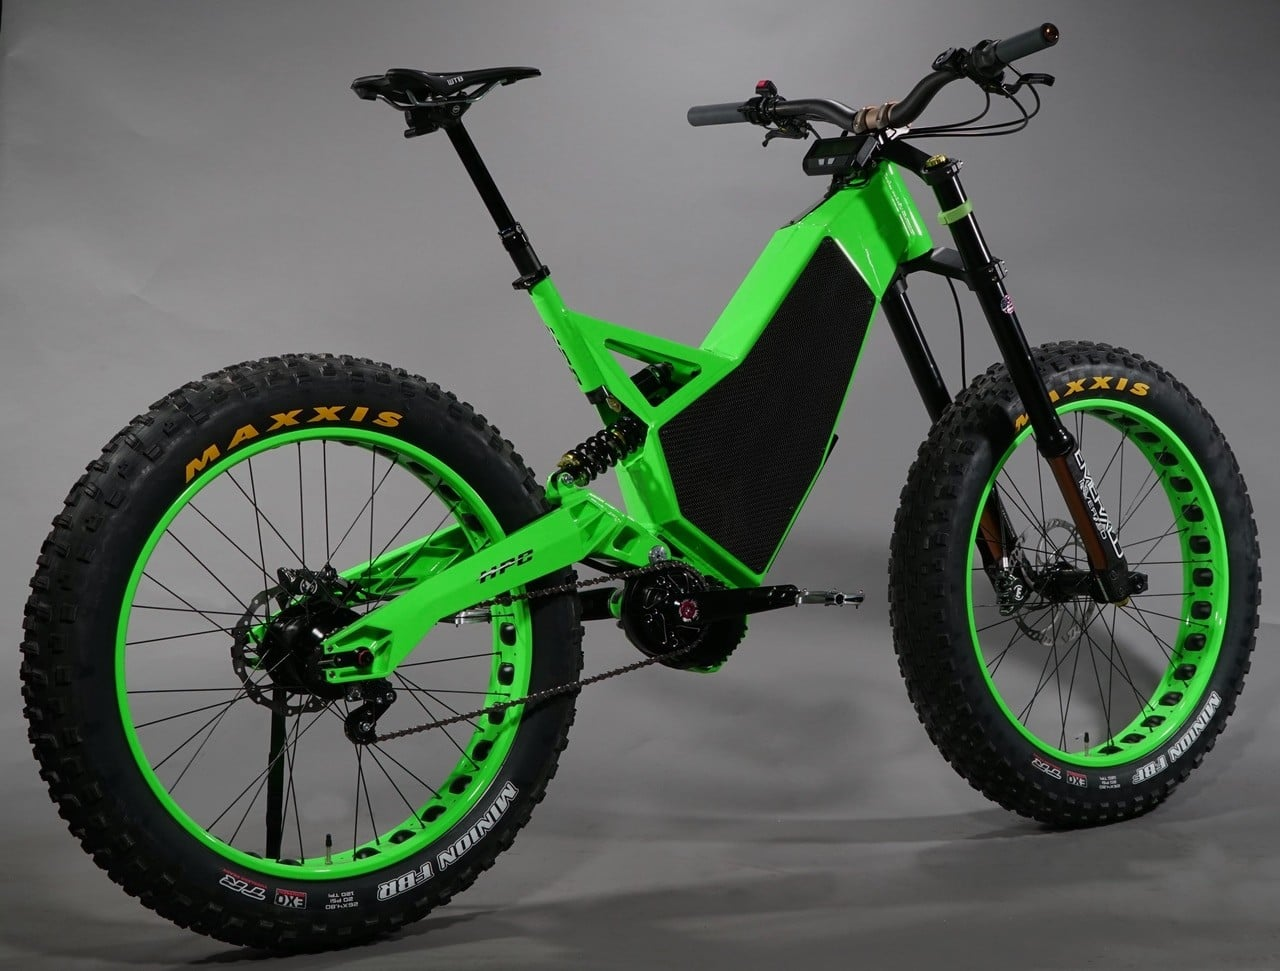 All Terrain Bike >> 2019 Hpc Revolution All Terrain Bike Men S Gear